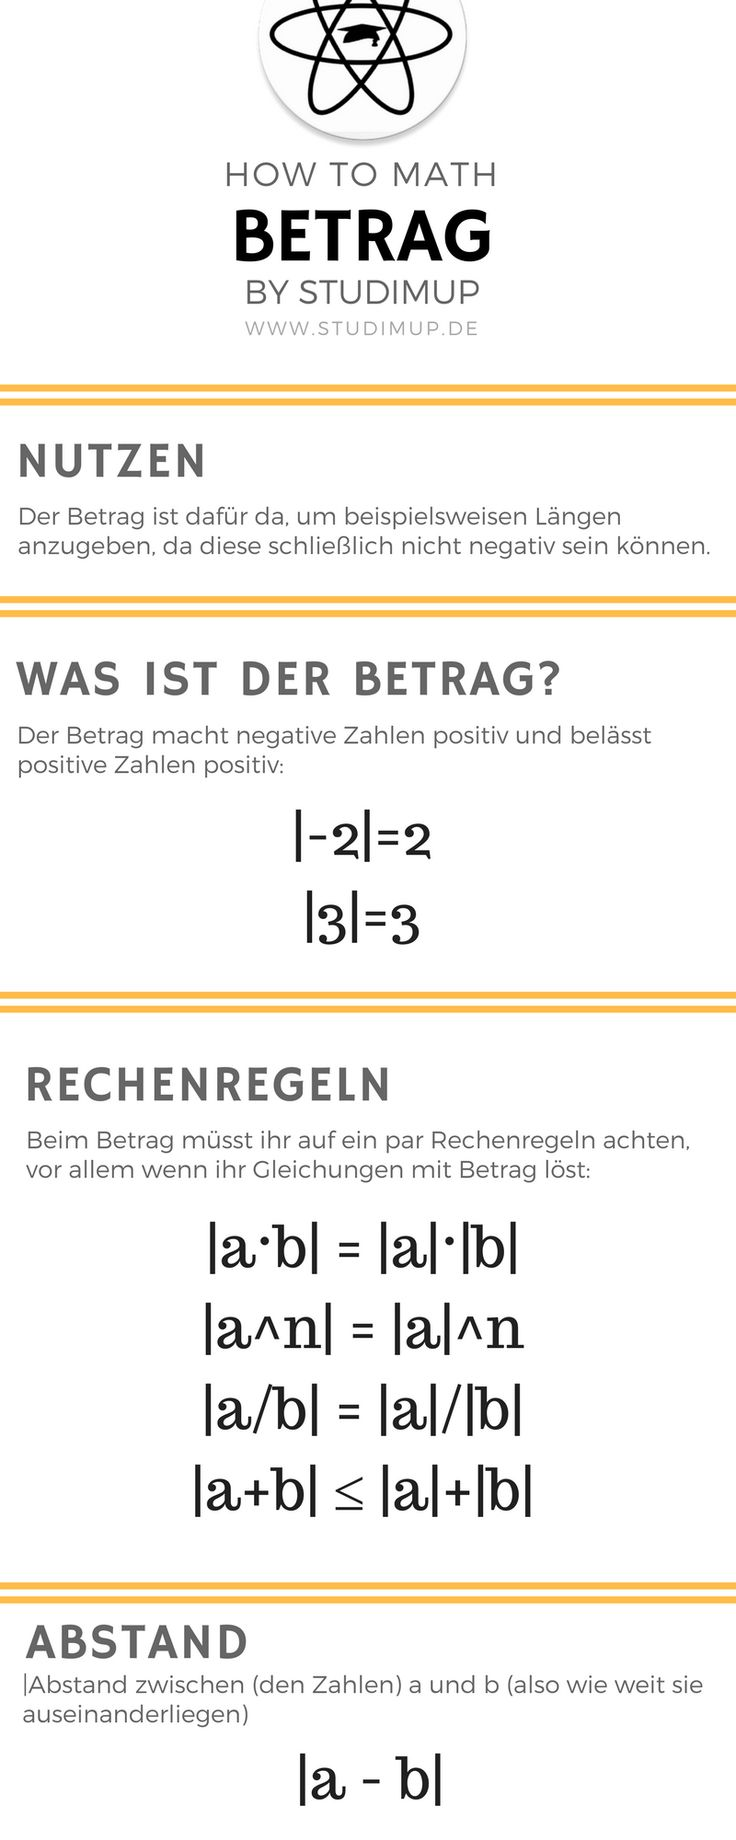 Beautiful Ib Math Hl Arbeitsblatt Festooning - Mathe Arbeitsblatt ...